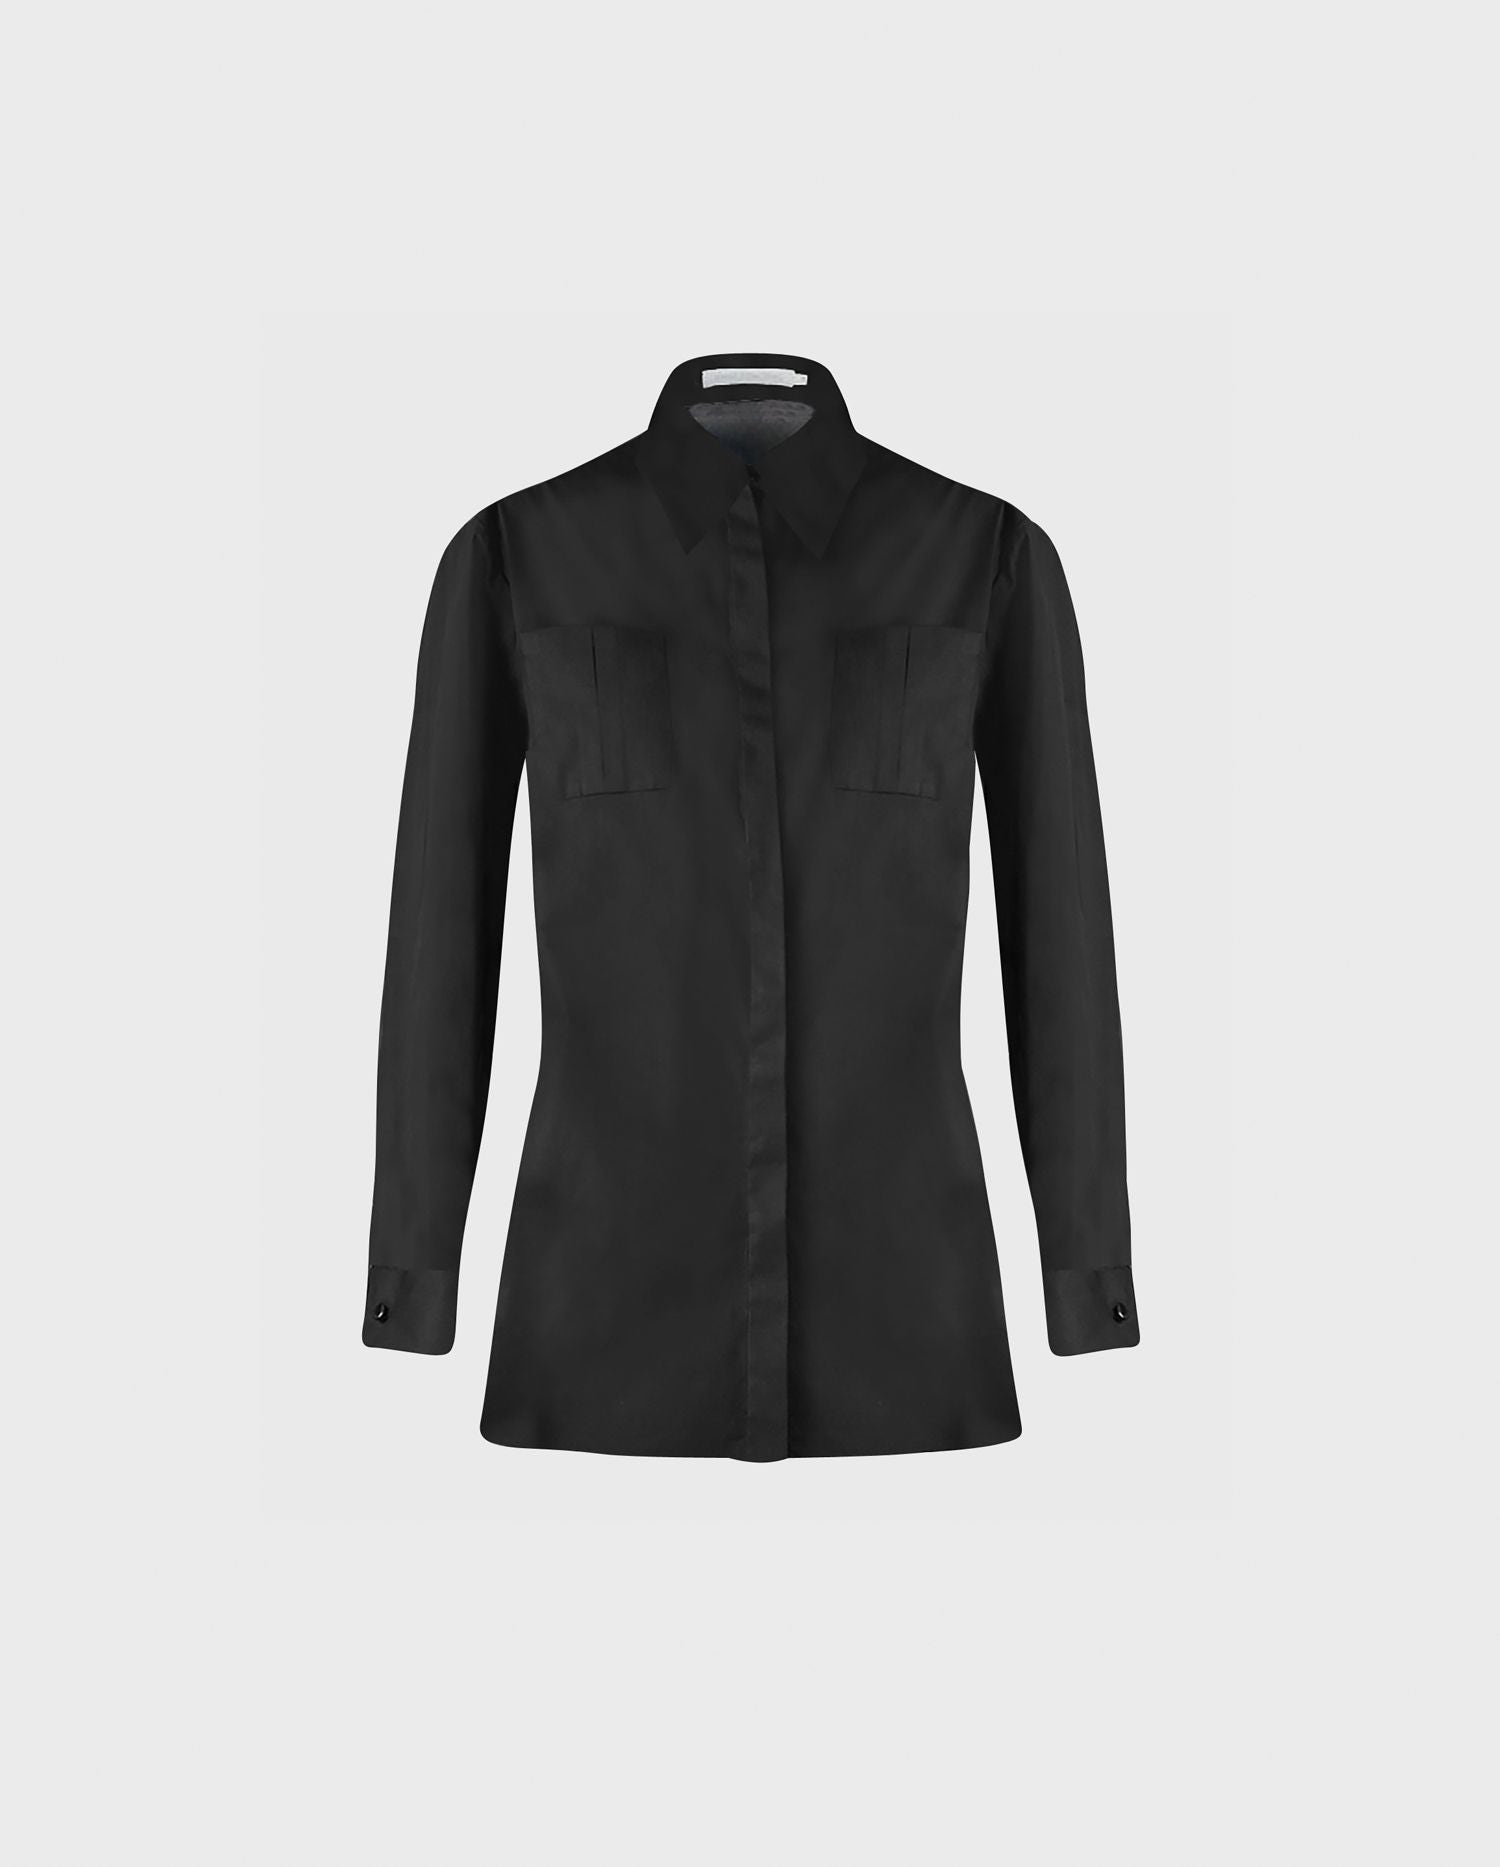 Anne Fontaine ALIANA Shirt: High-low black poplin shirt with detachable collar